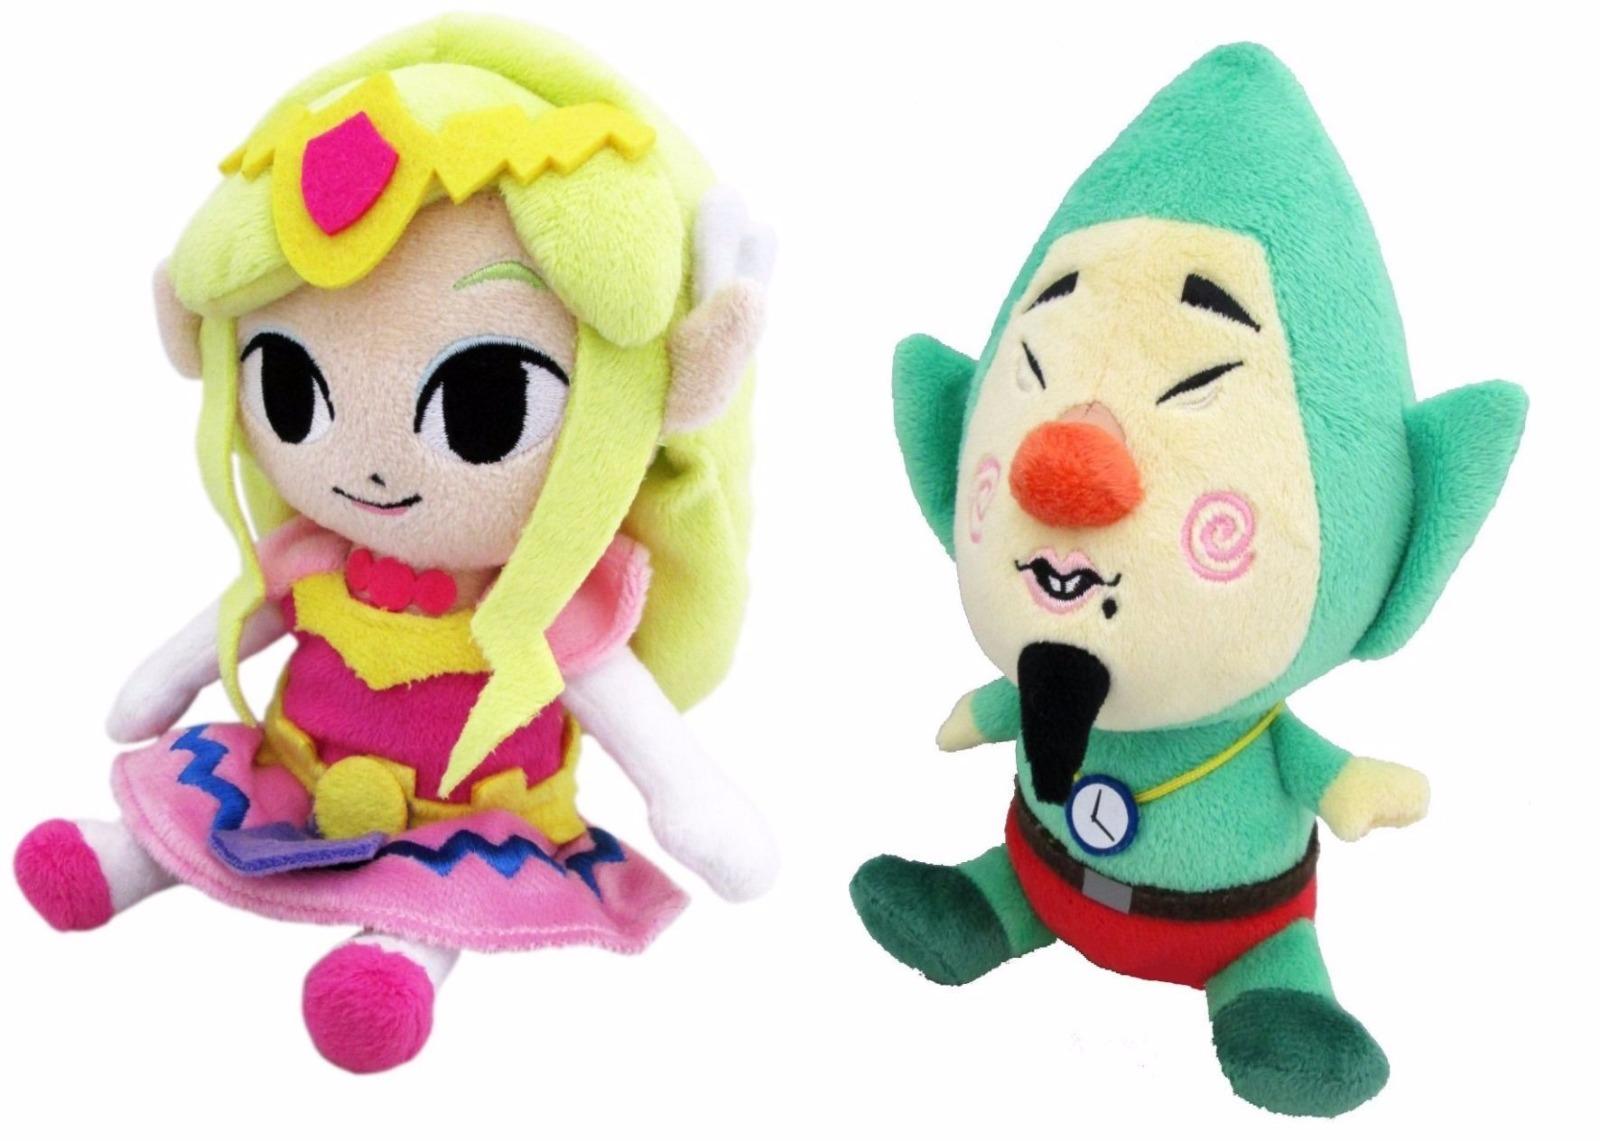 Sanei Legend Of Zelda Wind Waker 8 Princess Zelda 7 Tingle Plush